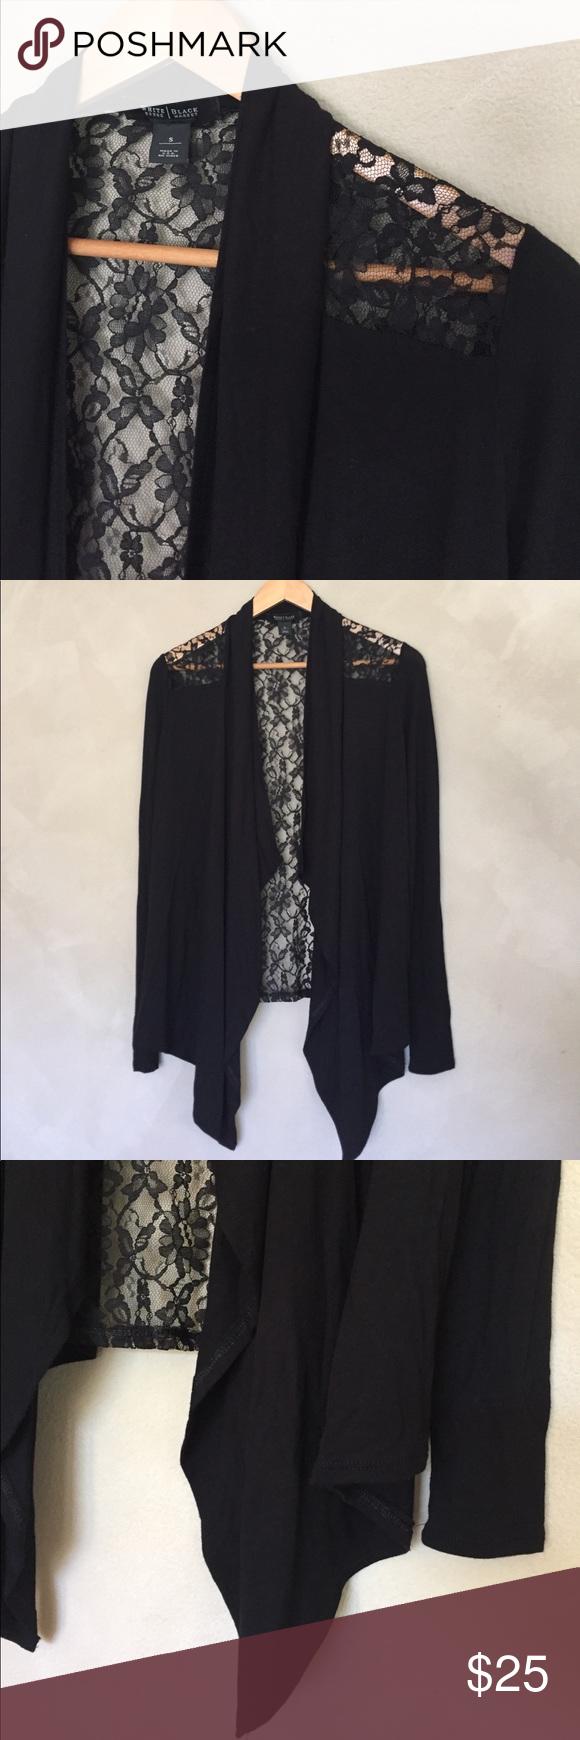 White House Black Market lace cardigan | Lightweight cardigan